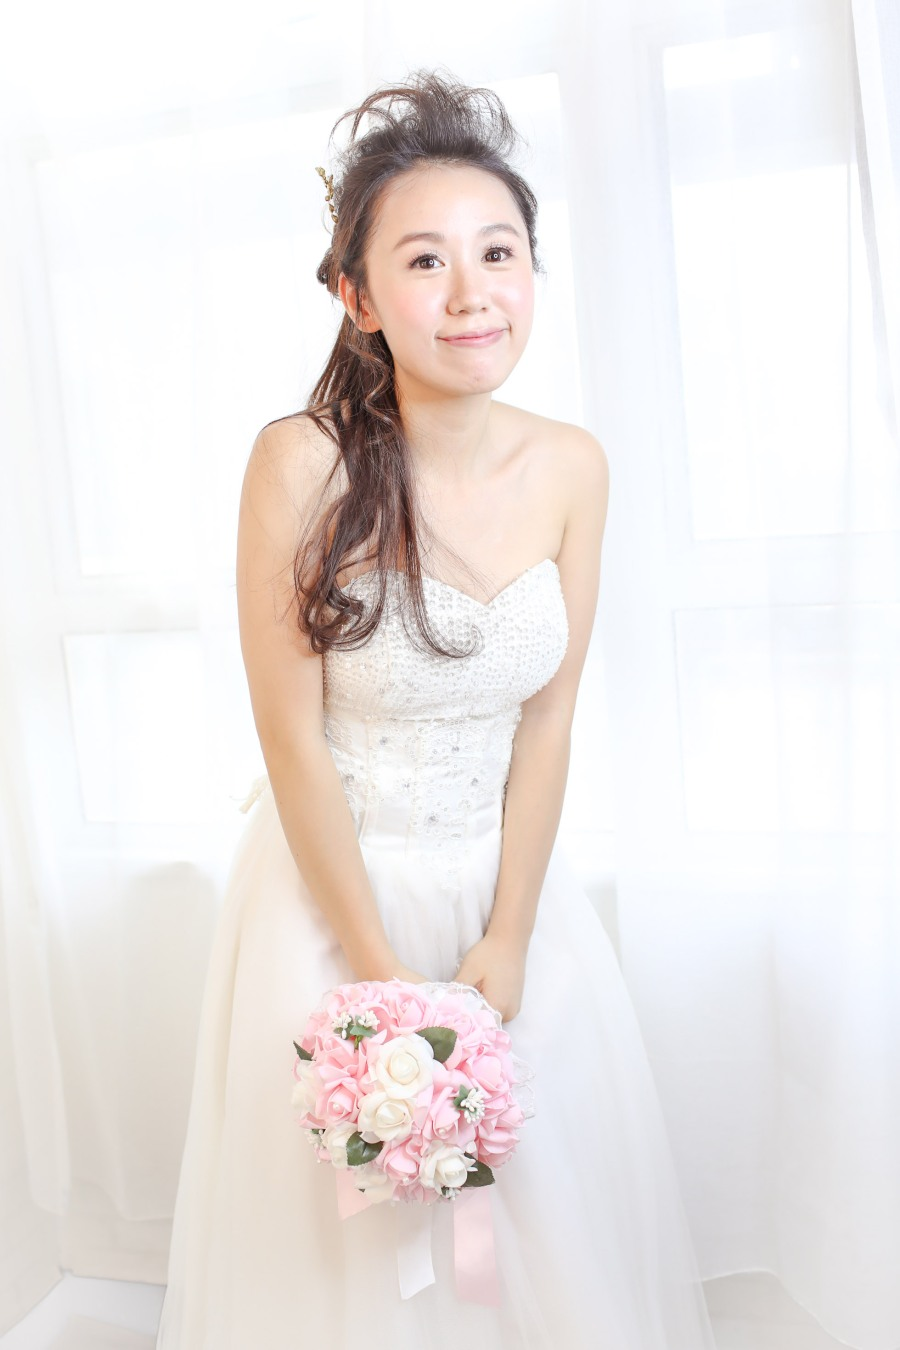 韓式新娘化妝髮型攝影_bridal_wedding_Korea_makeup_hairstyling_Top_MUA_paulstylist_photography_hk_stephanie-7